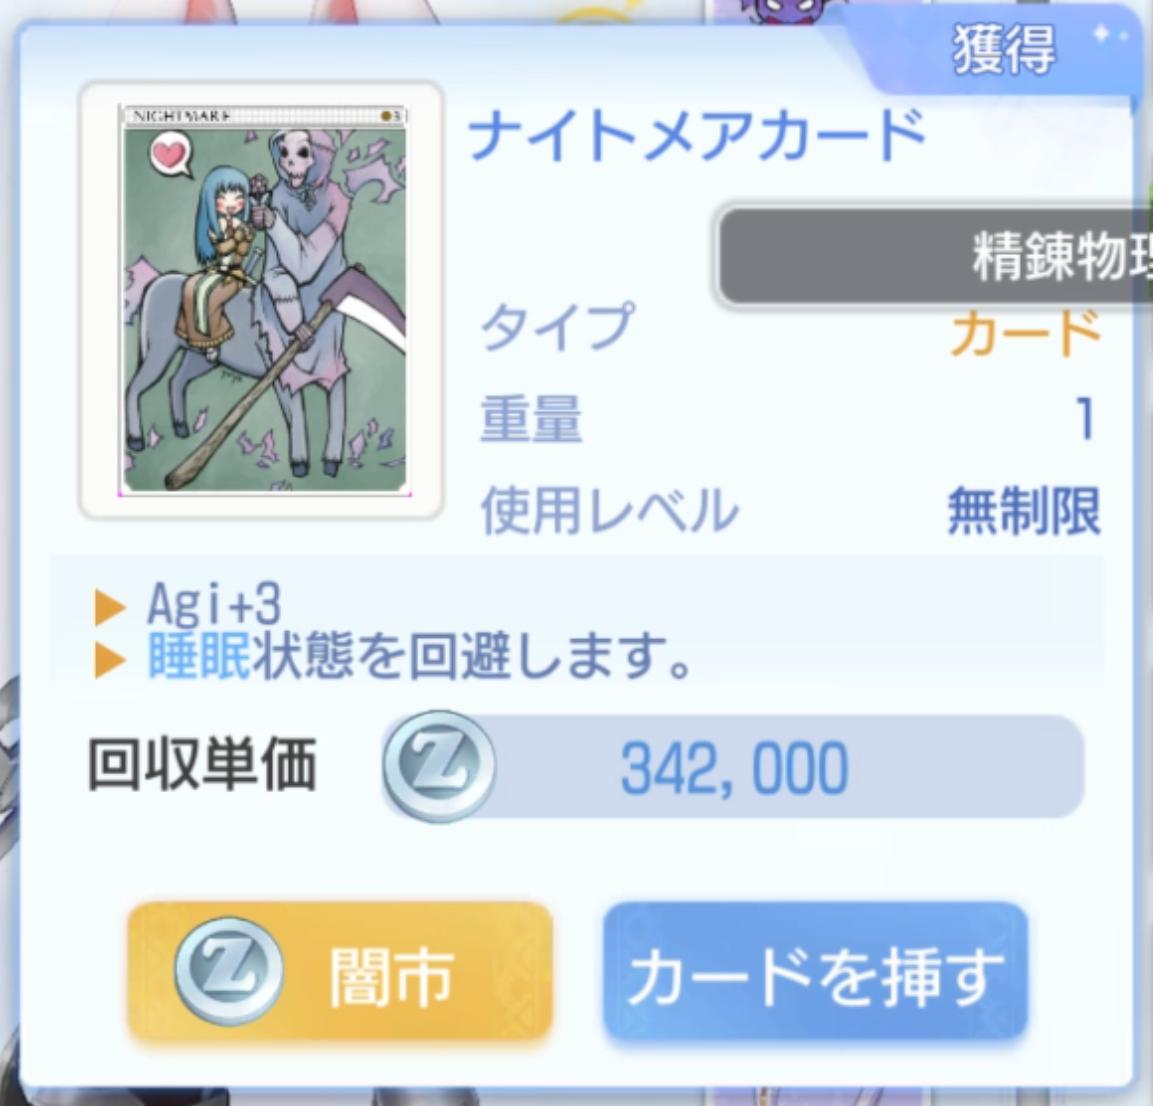 f:id:yamada_ragnarok:20210914235504p:plain